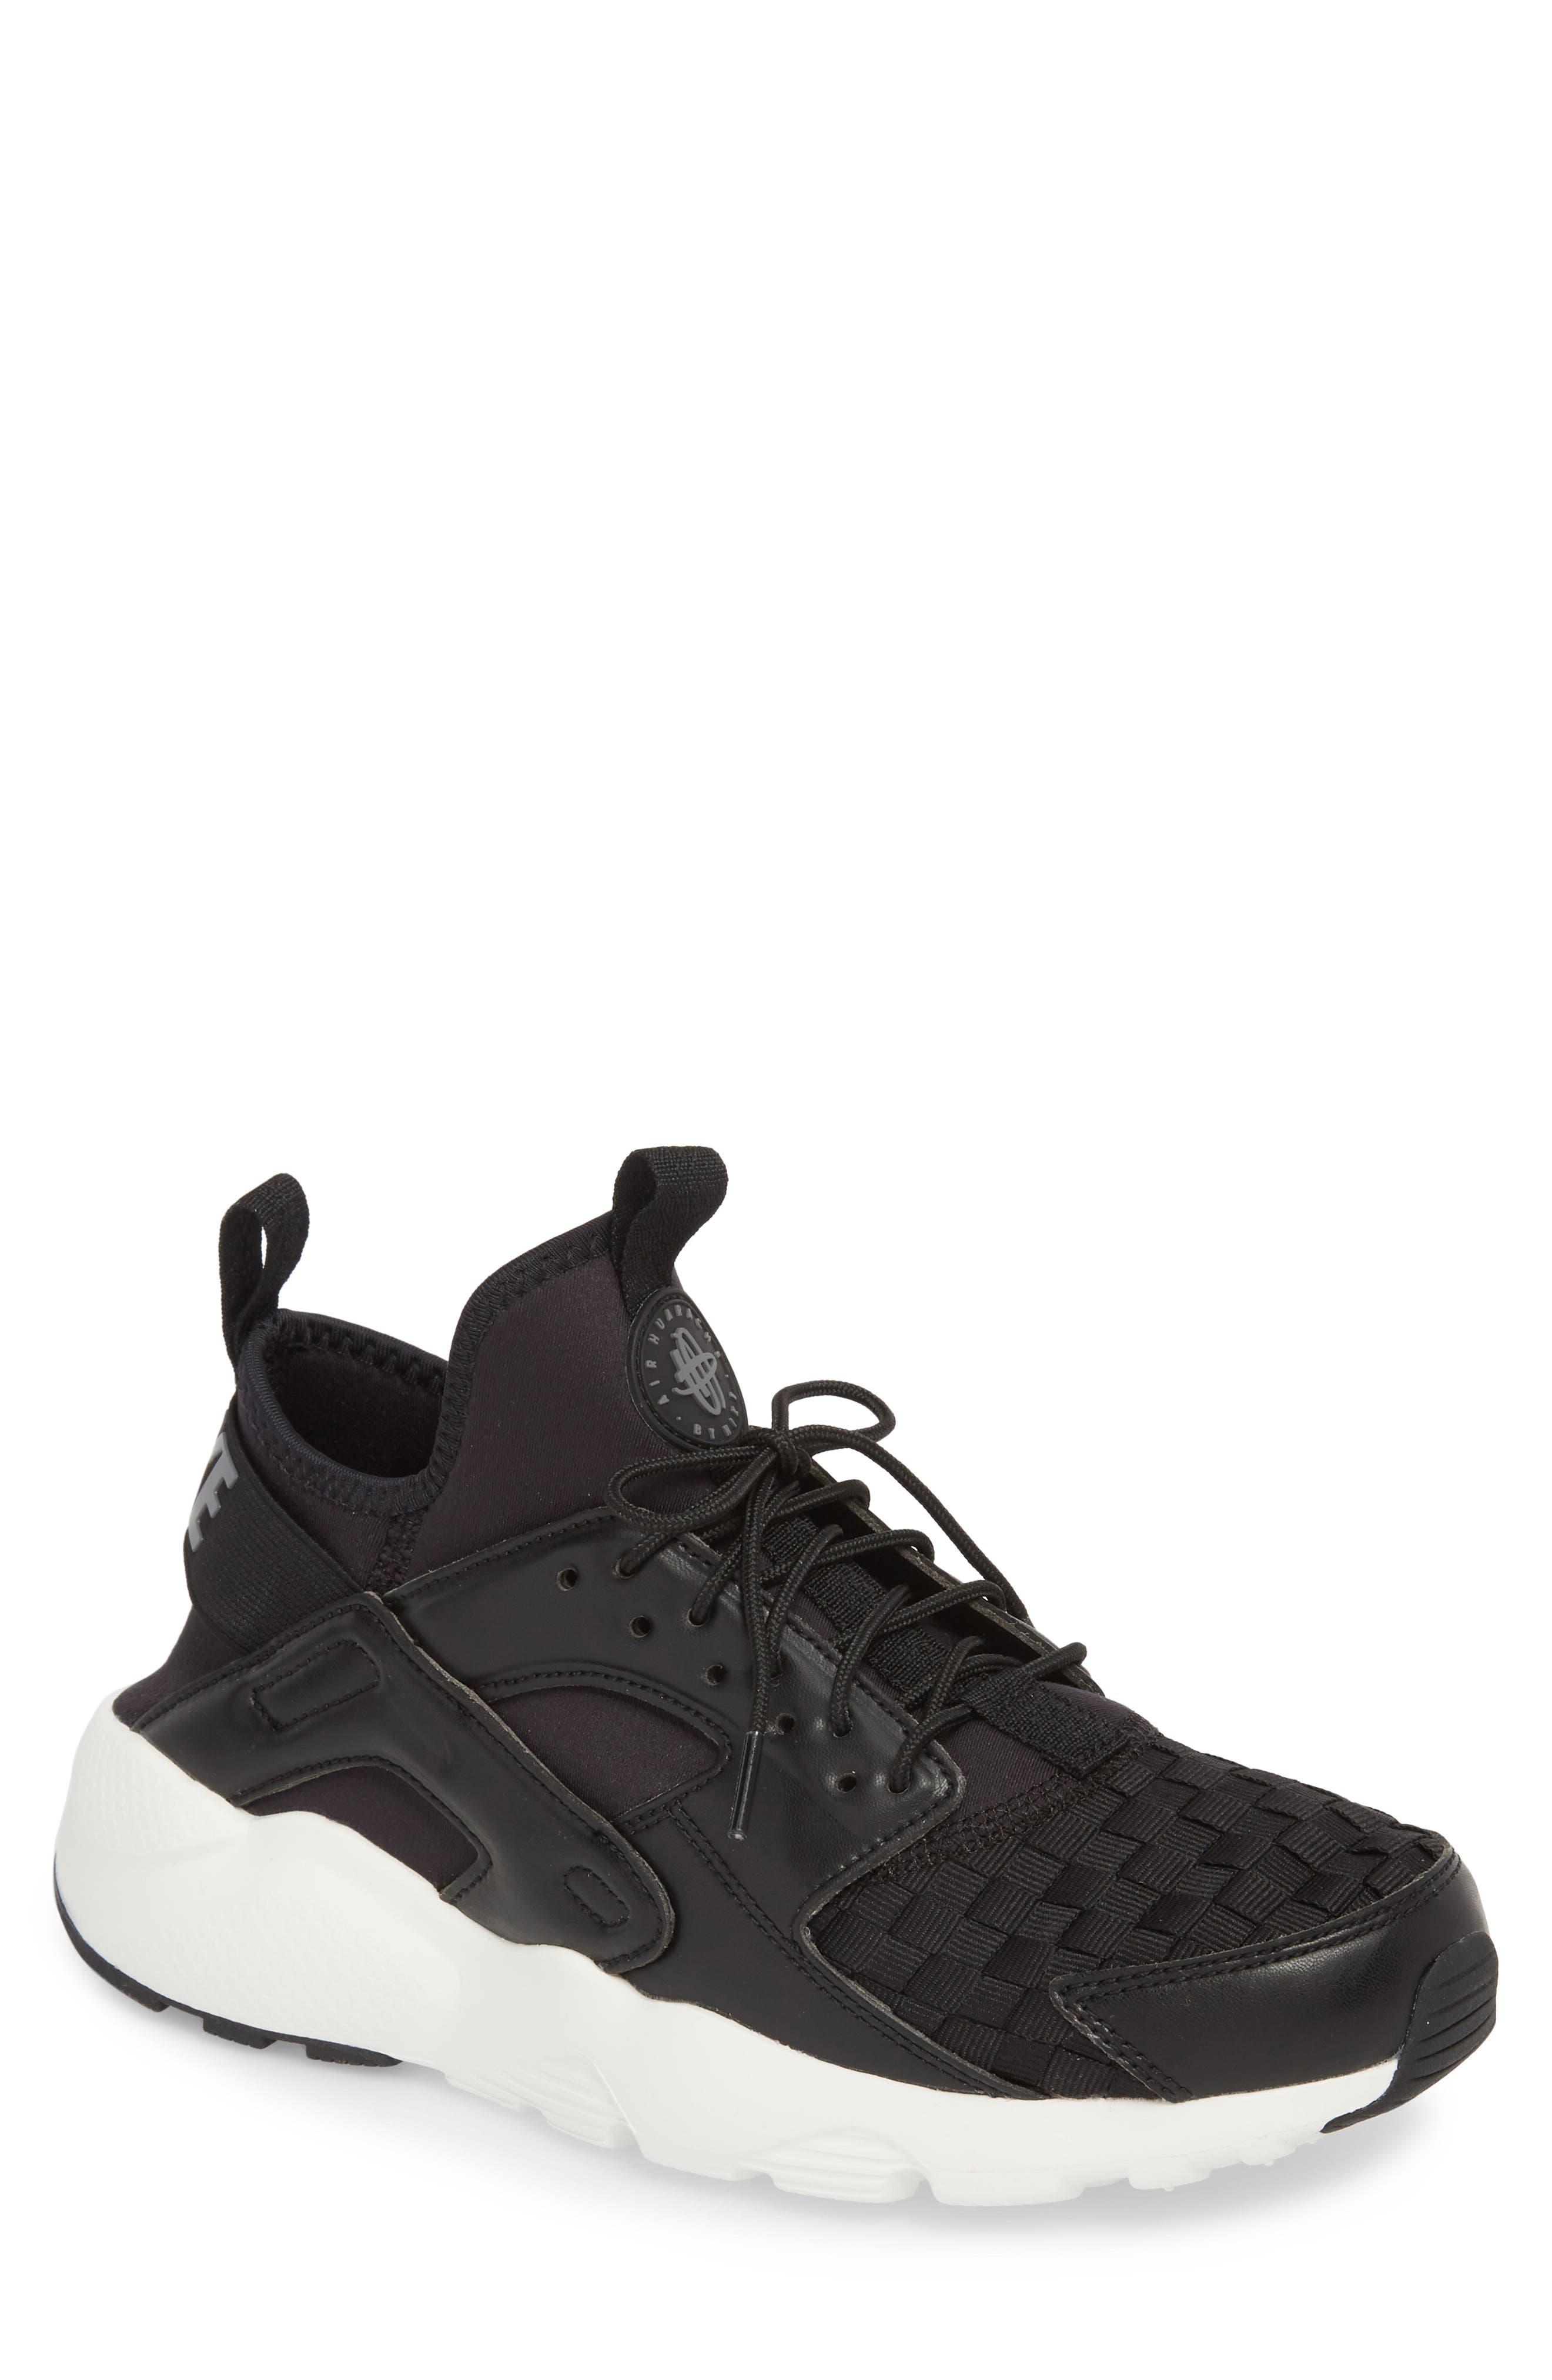 Alternate Image 1 Selected - Nike Air Huarache Run Ultra SE Sneaker (Men)